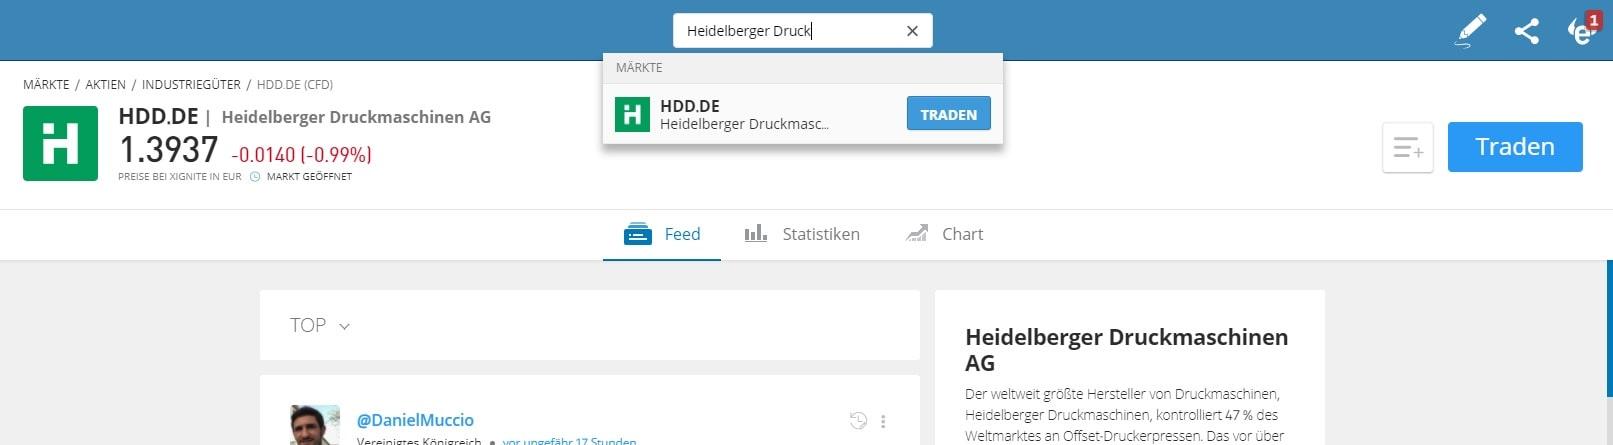 Heidelberger Druckmaschinen Pennystock Kaufen